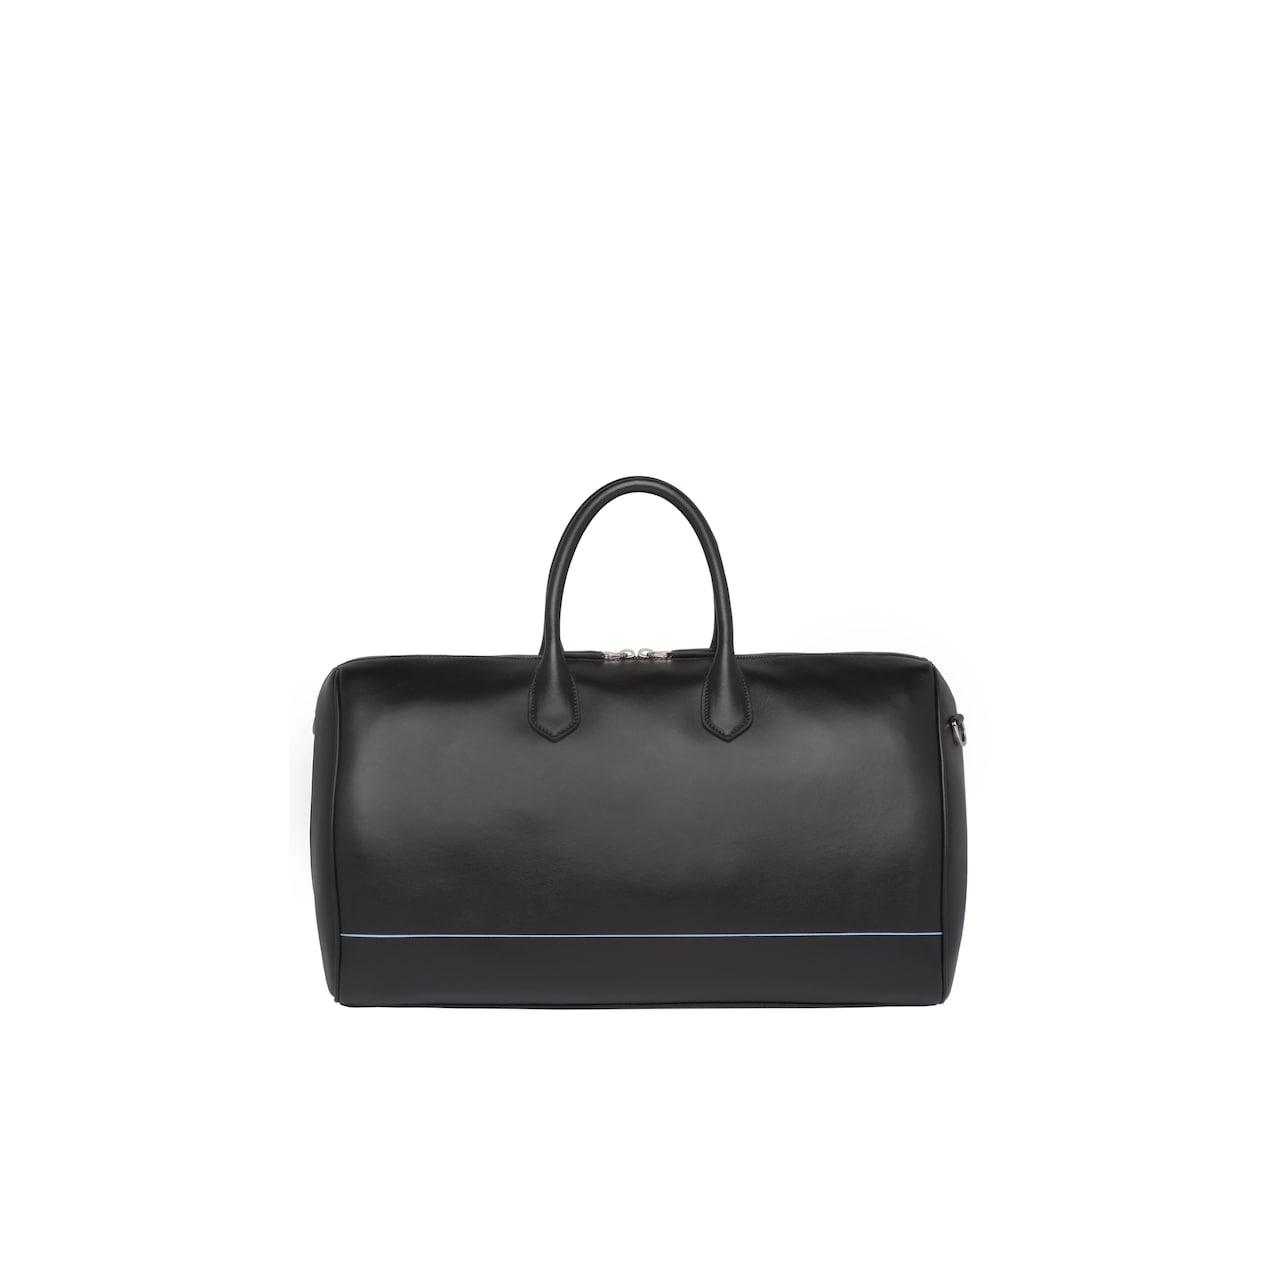 Leather travel bag